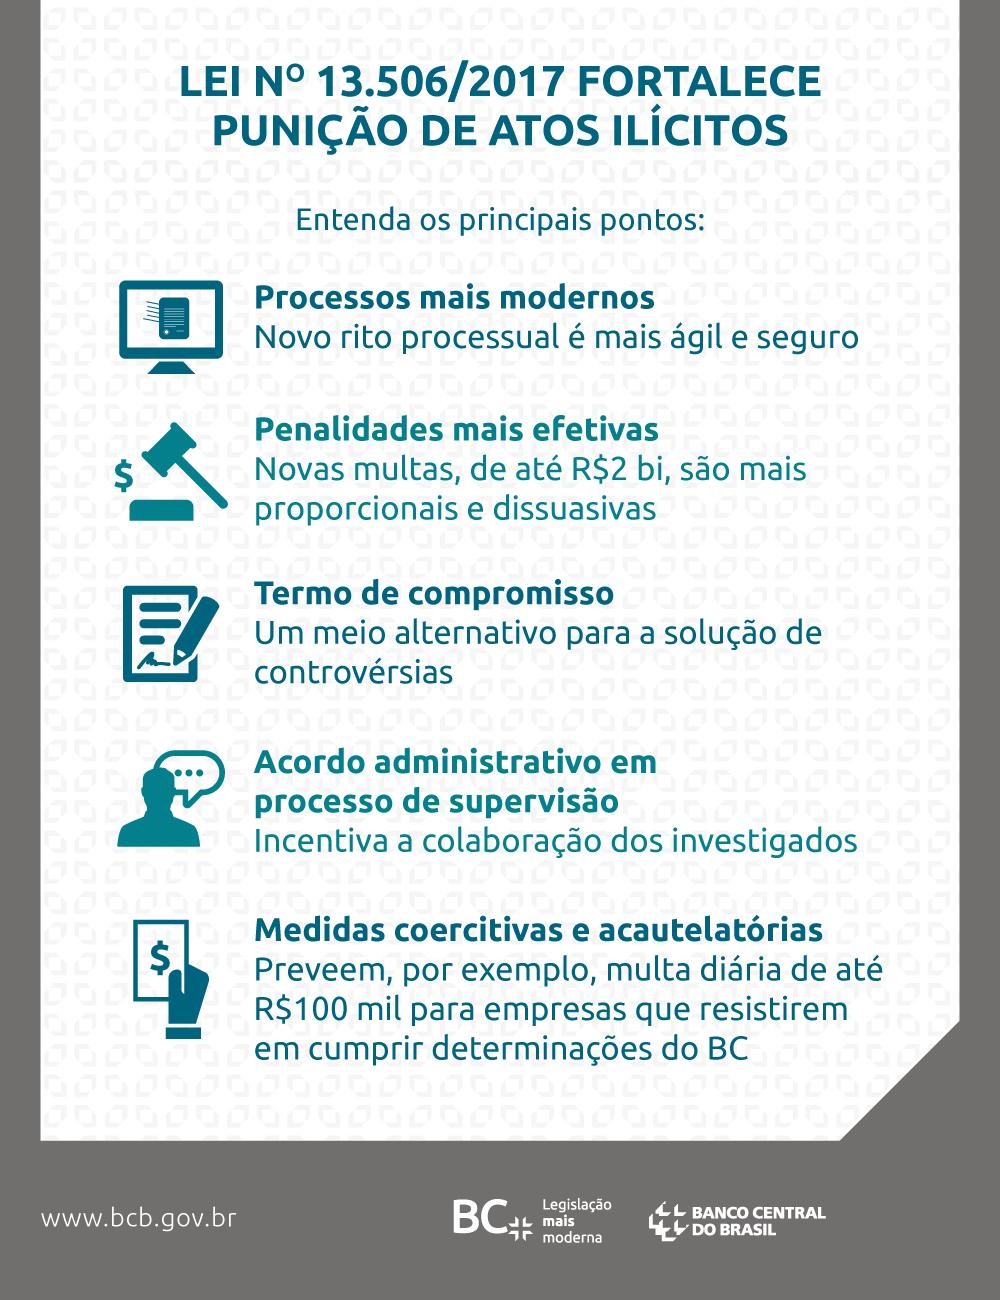 https://edicao-www.bcb.gov.br/conteudo/home-ptbr/PublishingImages/Jornalismo%20Interno/Diorf/Lei%2013506-2017%20(ex%20mp%20784)/post_MP_lei.png